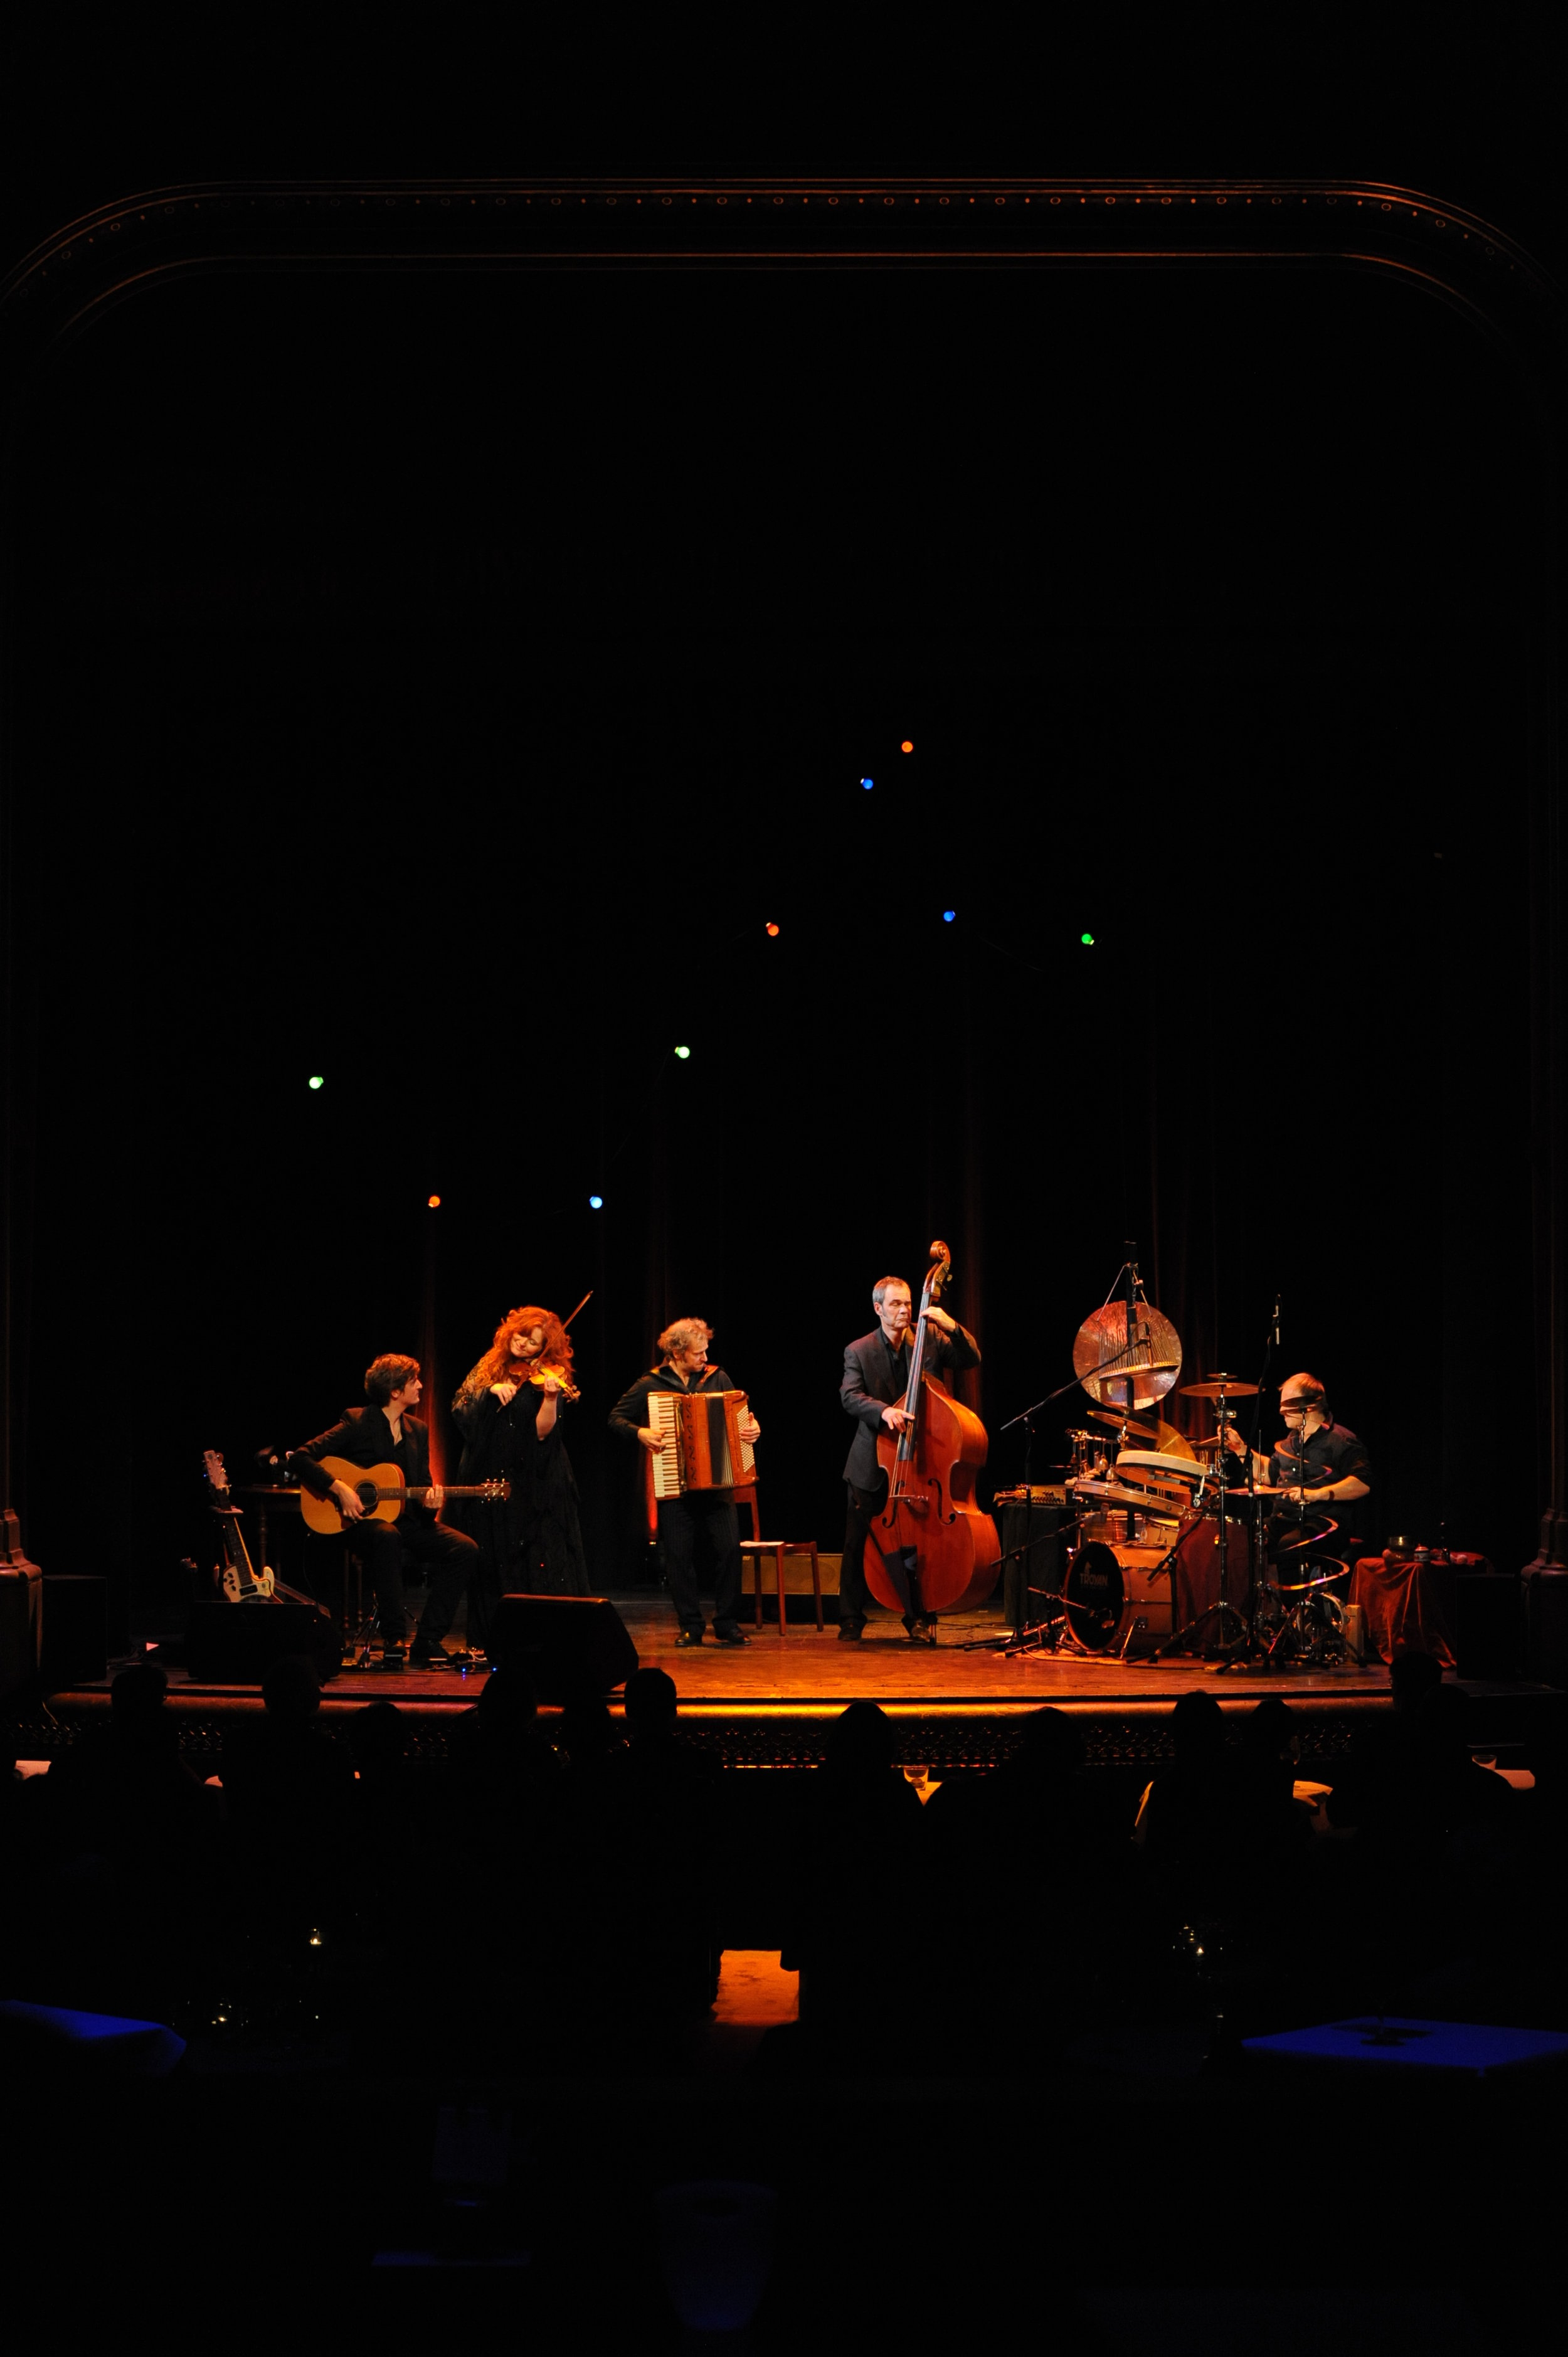 Martina Eisenreich Quintett live (3). Fotography by Mike Meyer. (Print Resolution)